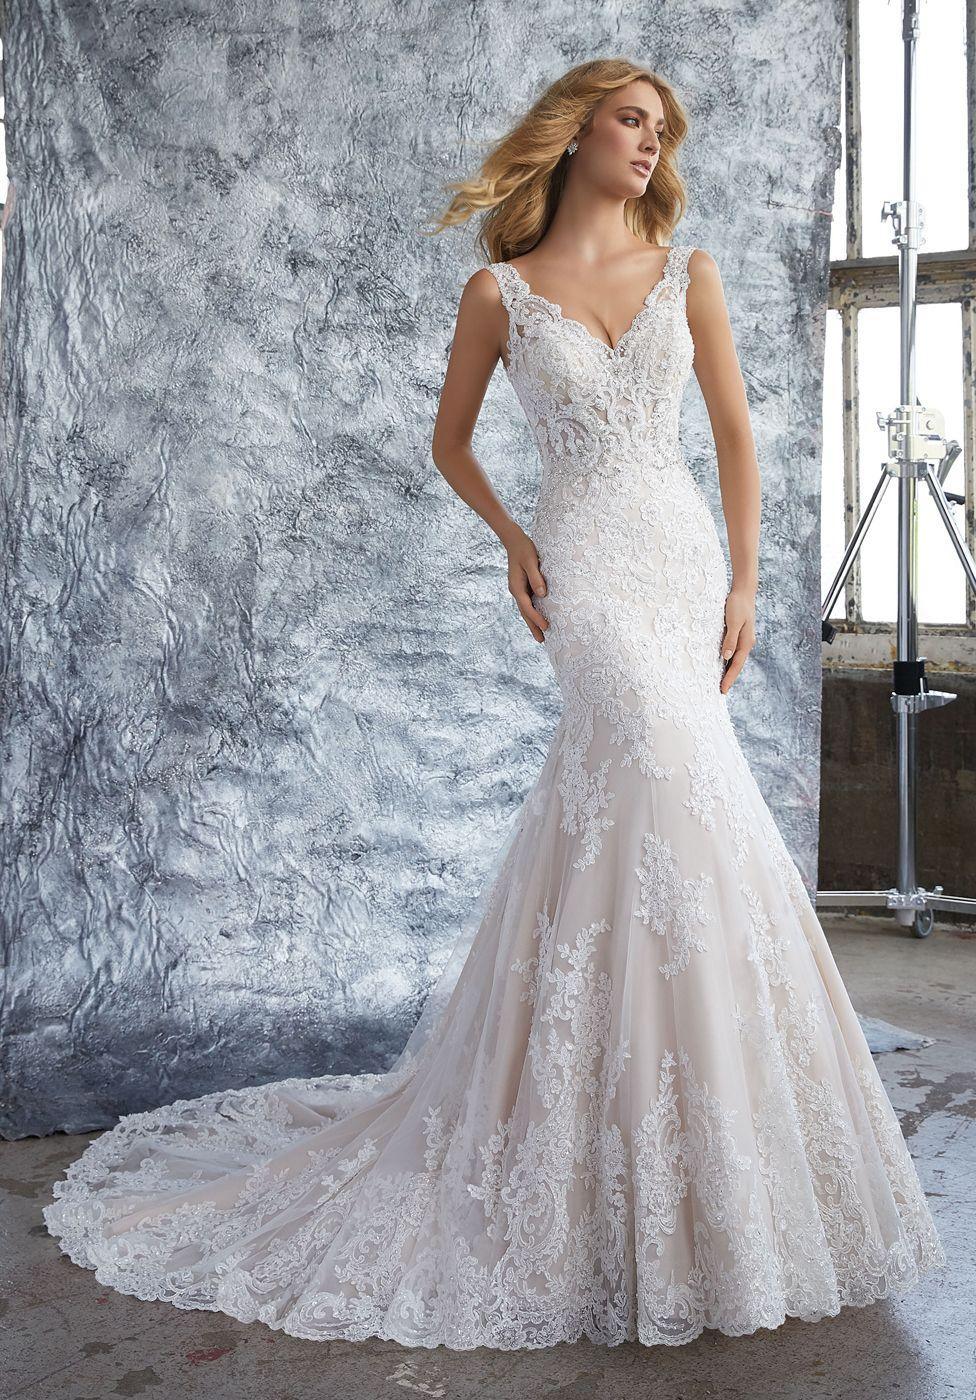 Mori Lee 8212 Kristina V Neck Fit And Flare Bridal Gown V Neck Wedding Dress Fit Flare Wedding Dress Wedding Dresses